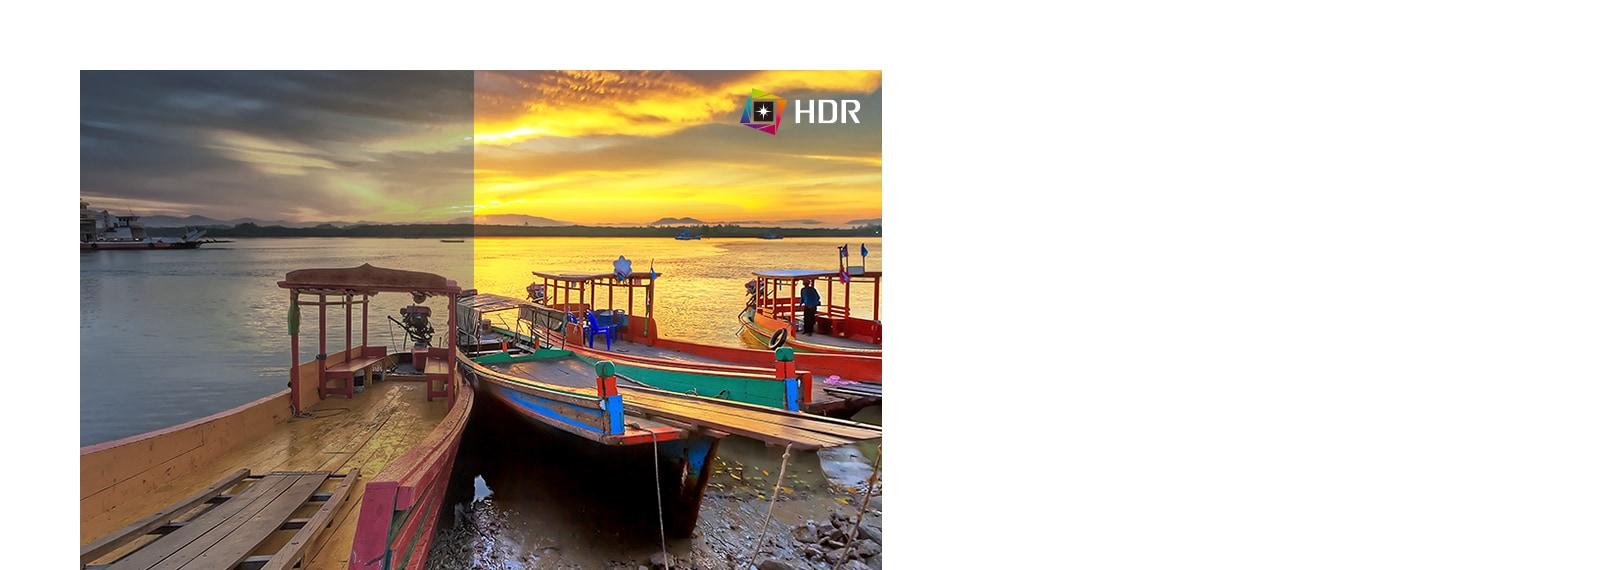 HDR 10: Detaljni kontrast